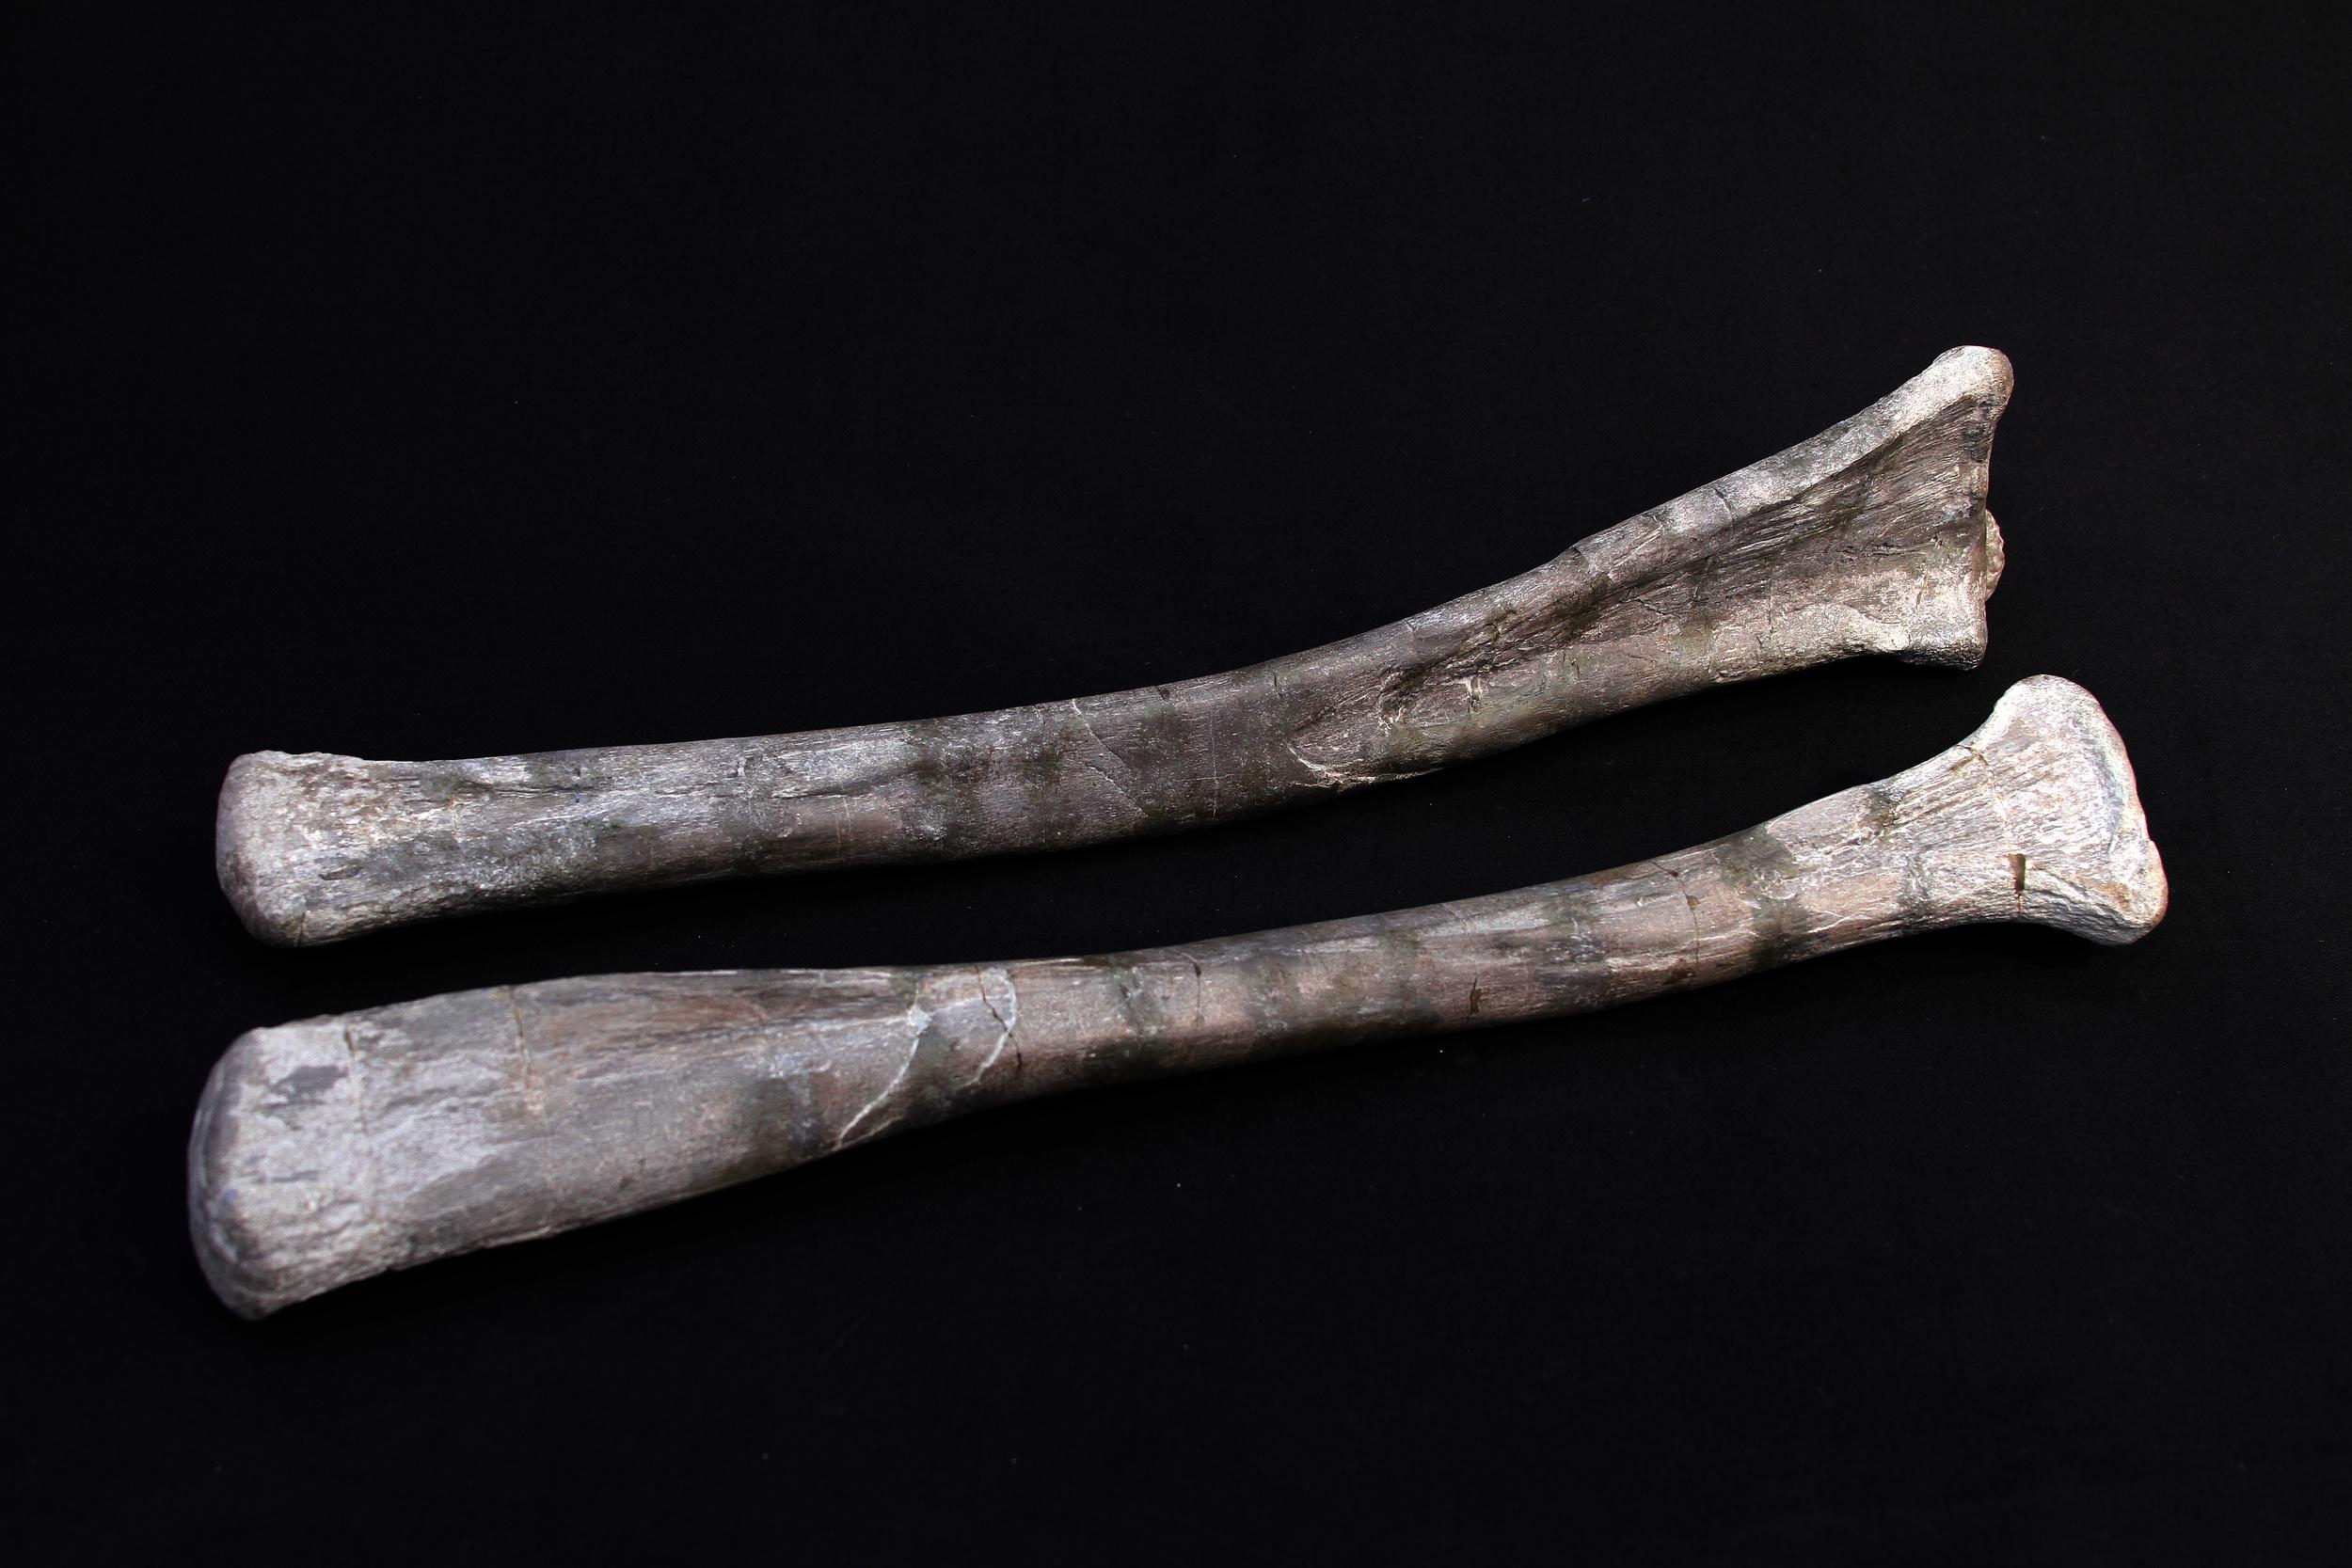 Hadrosaur radius and ulna